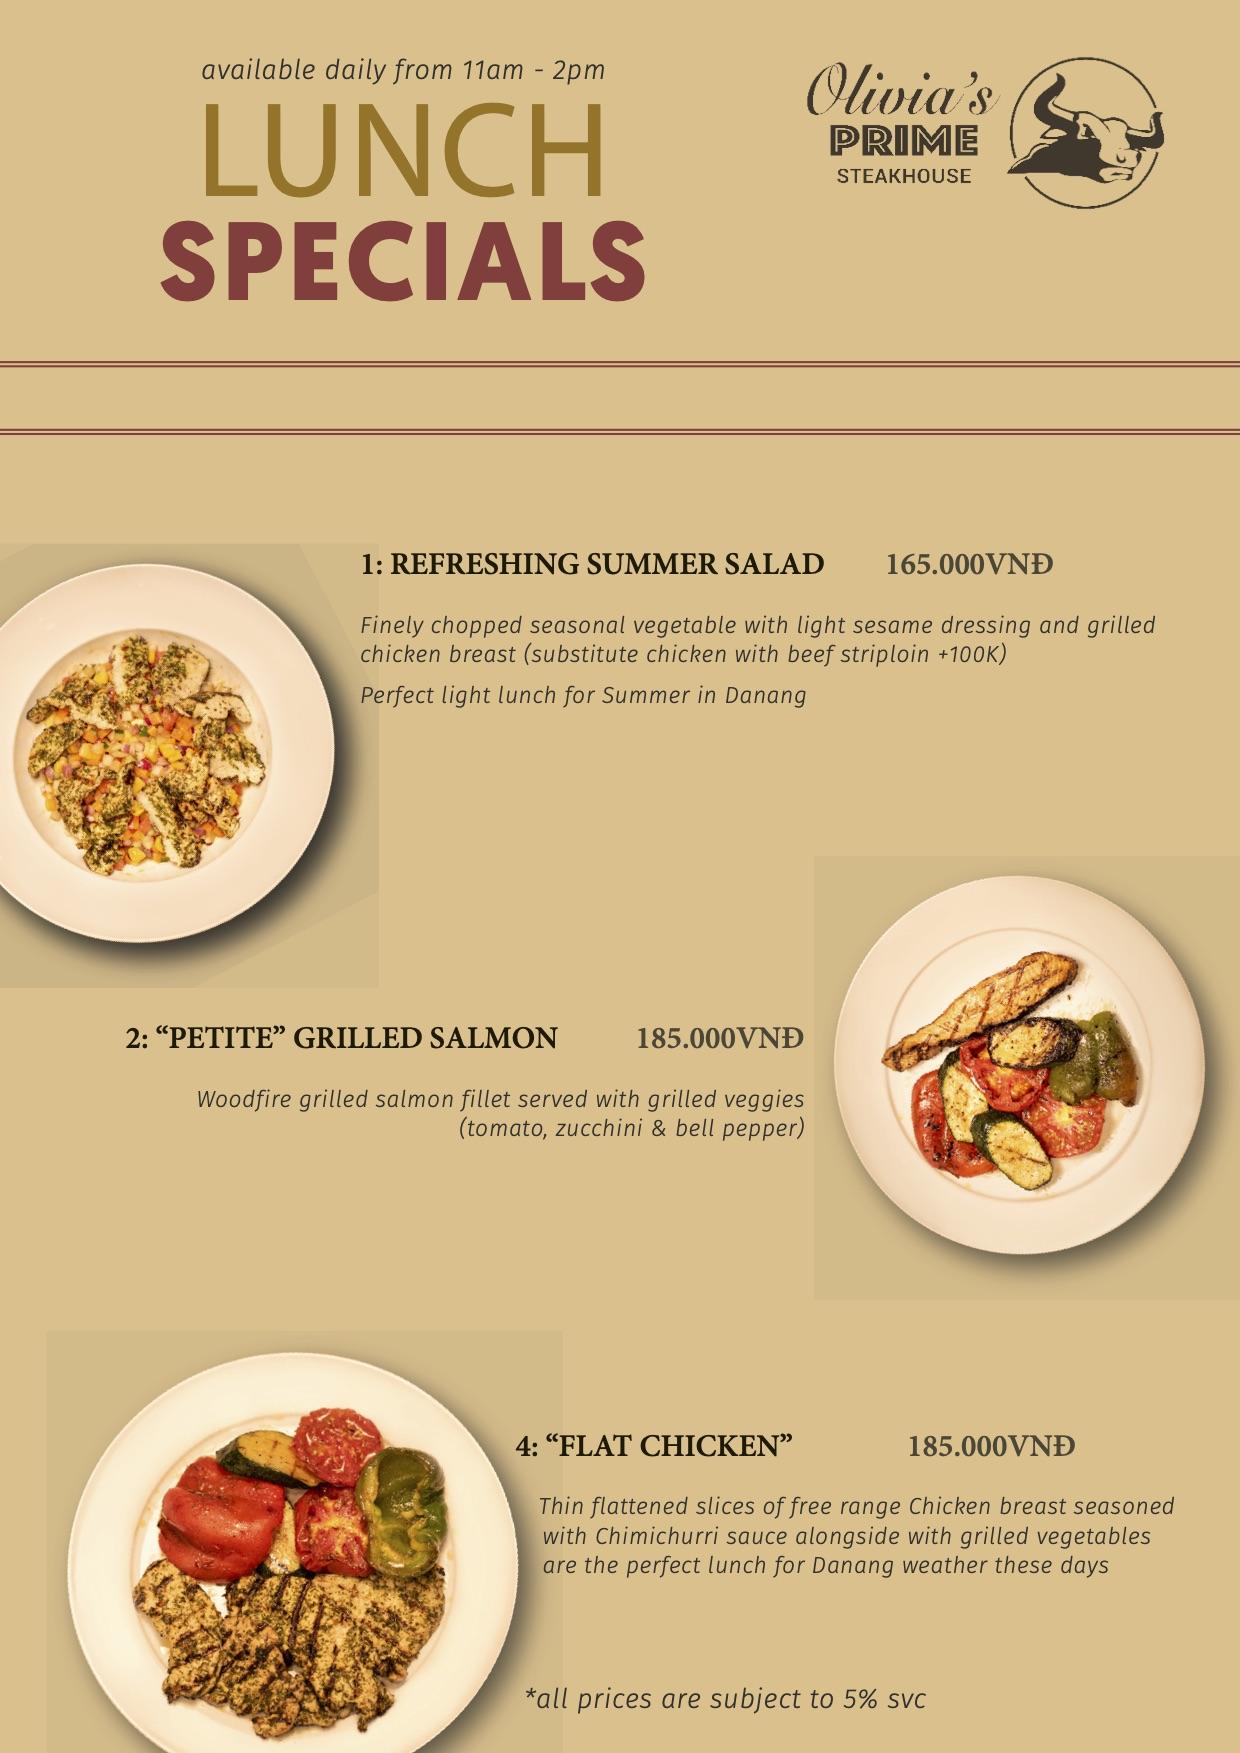 Olivia's Prime Steakhouse Lunch Menu